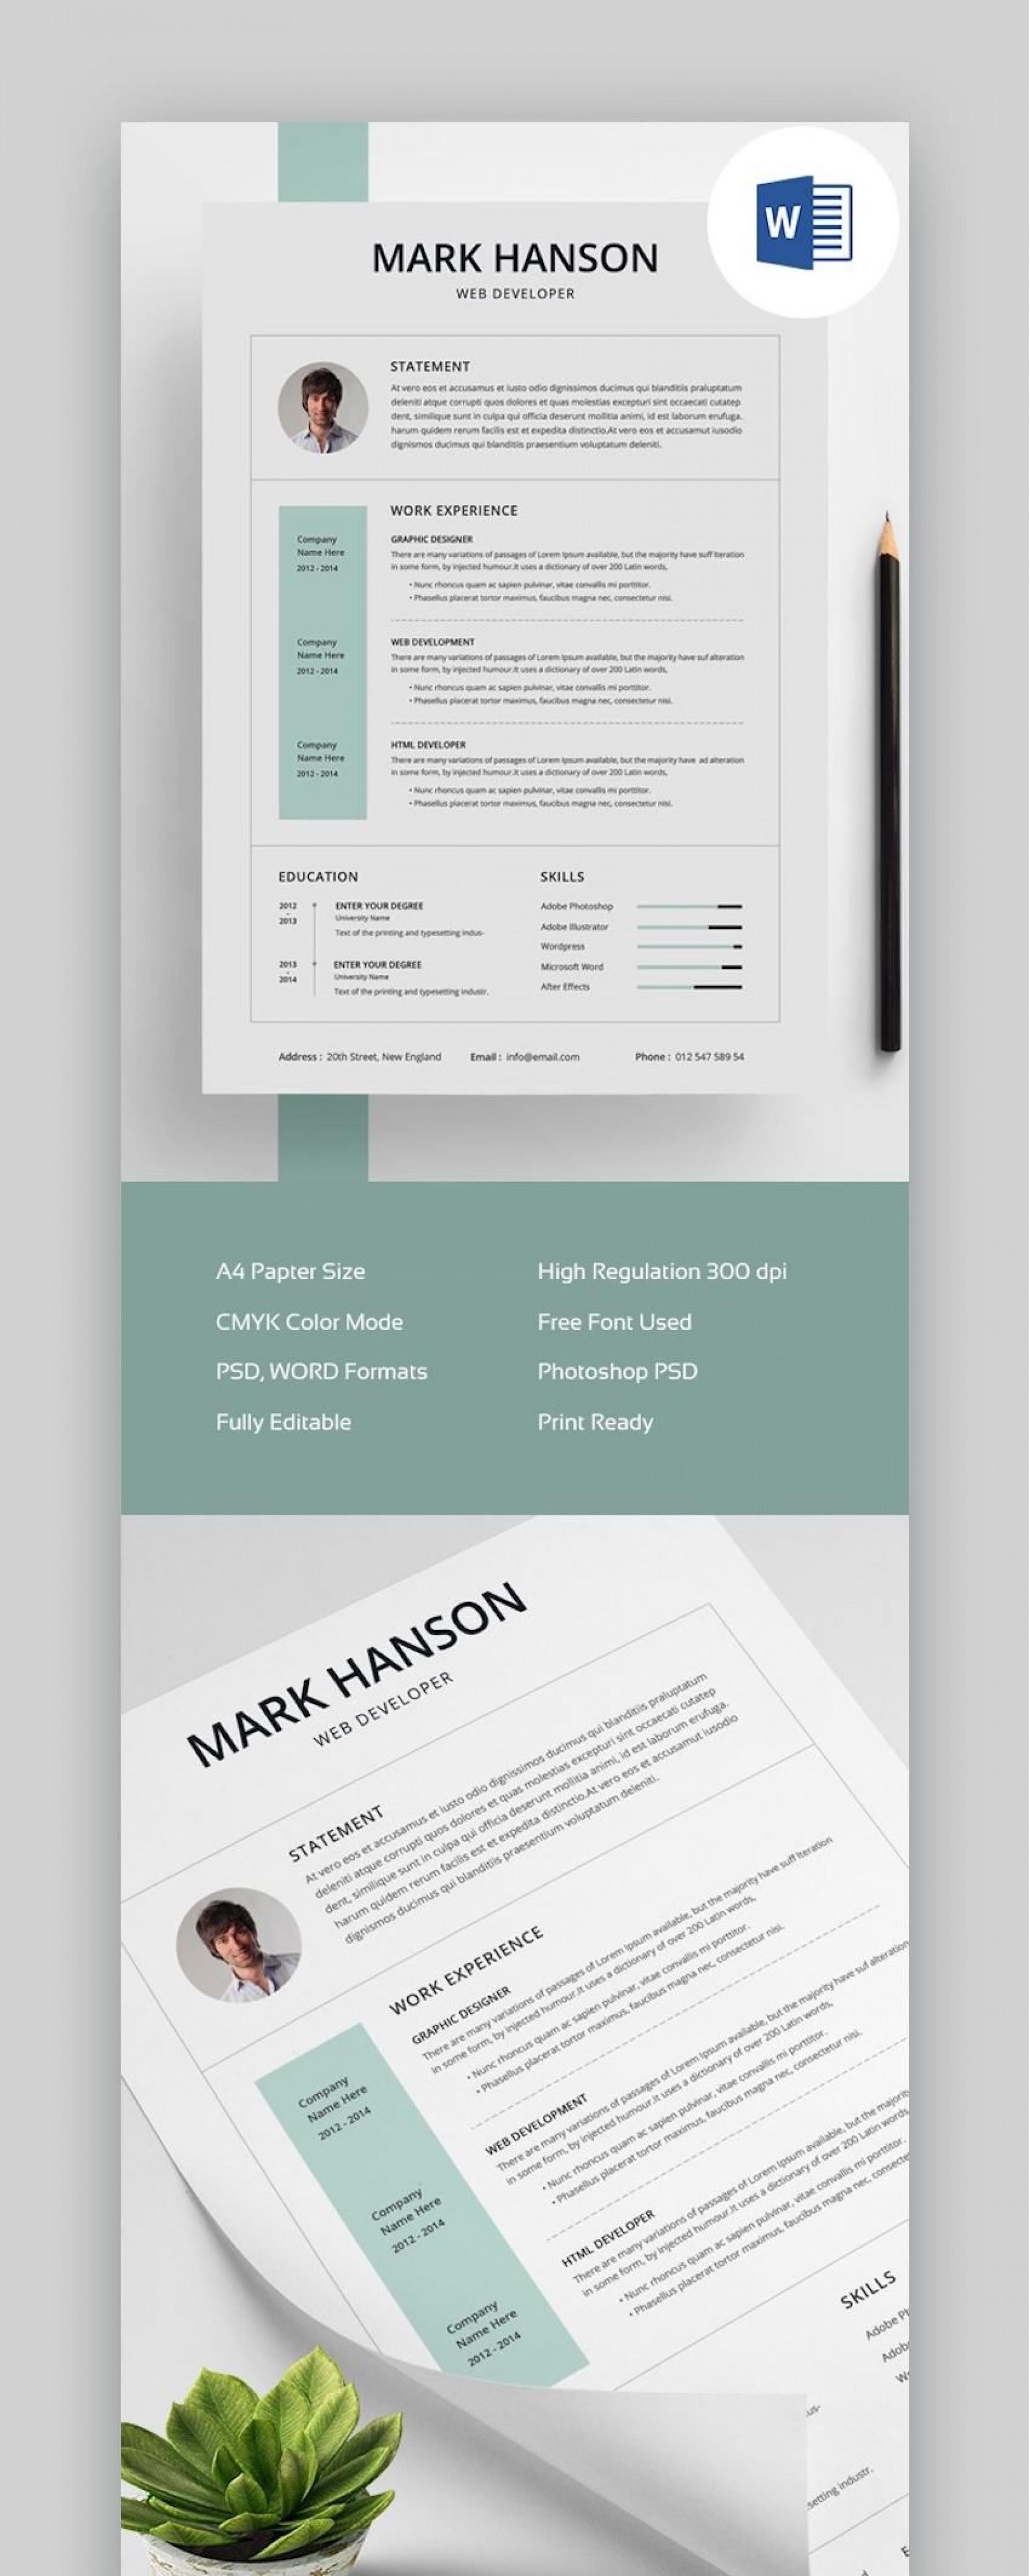 003 Singular Psd Resume Template Free Download Concept  Graphic Designer Creative Cv1920